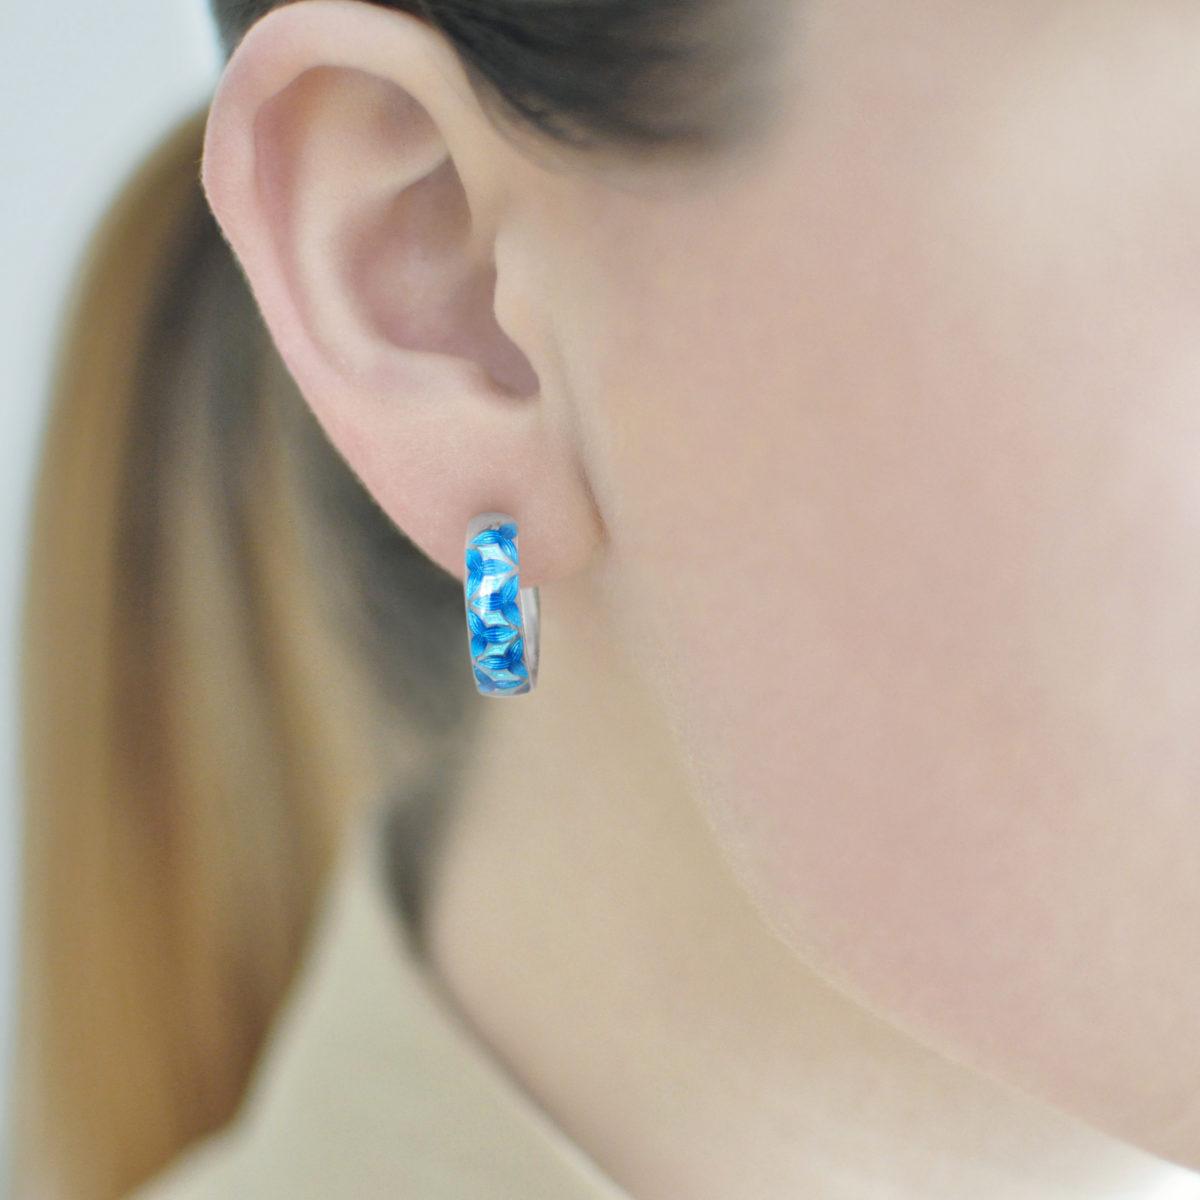 Serebro sinyaya 4 1200x1200 - Серьги «Трилистник», синяя